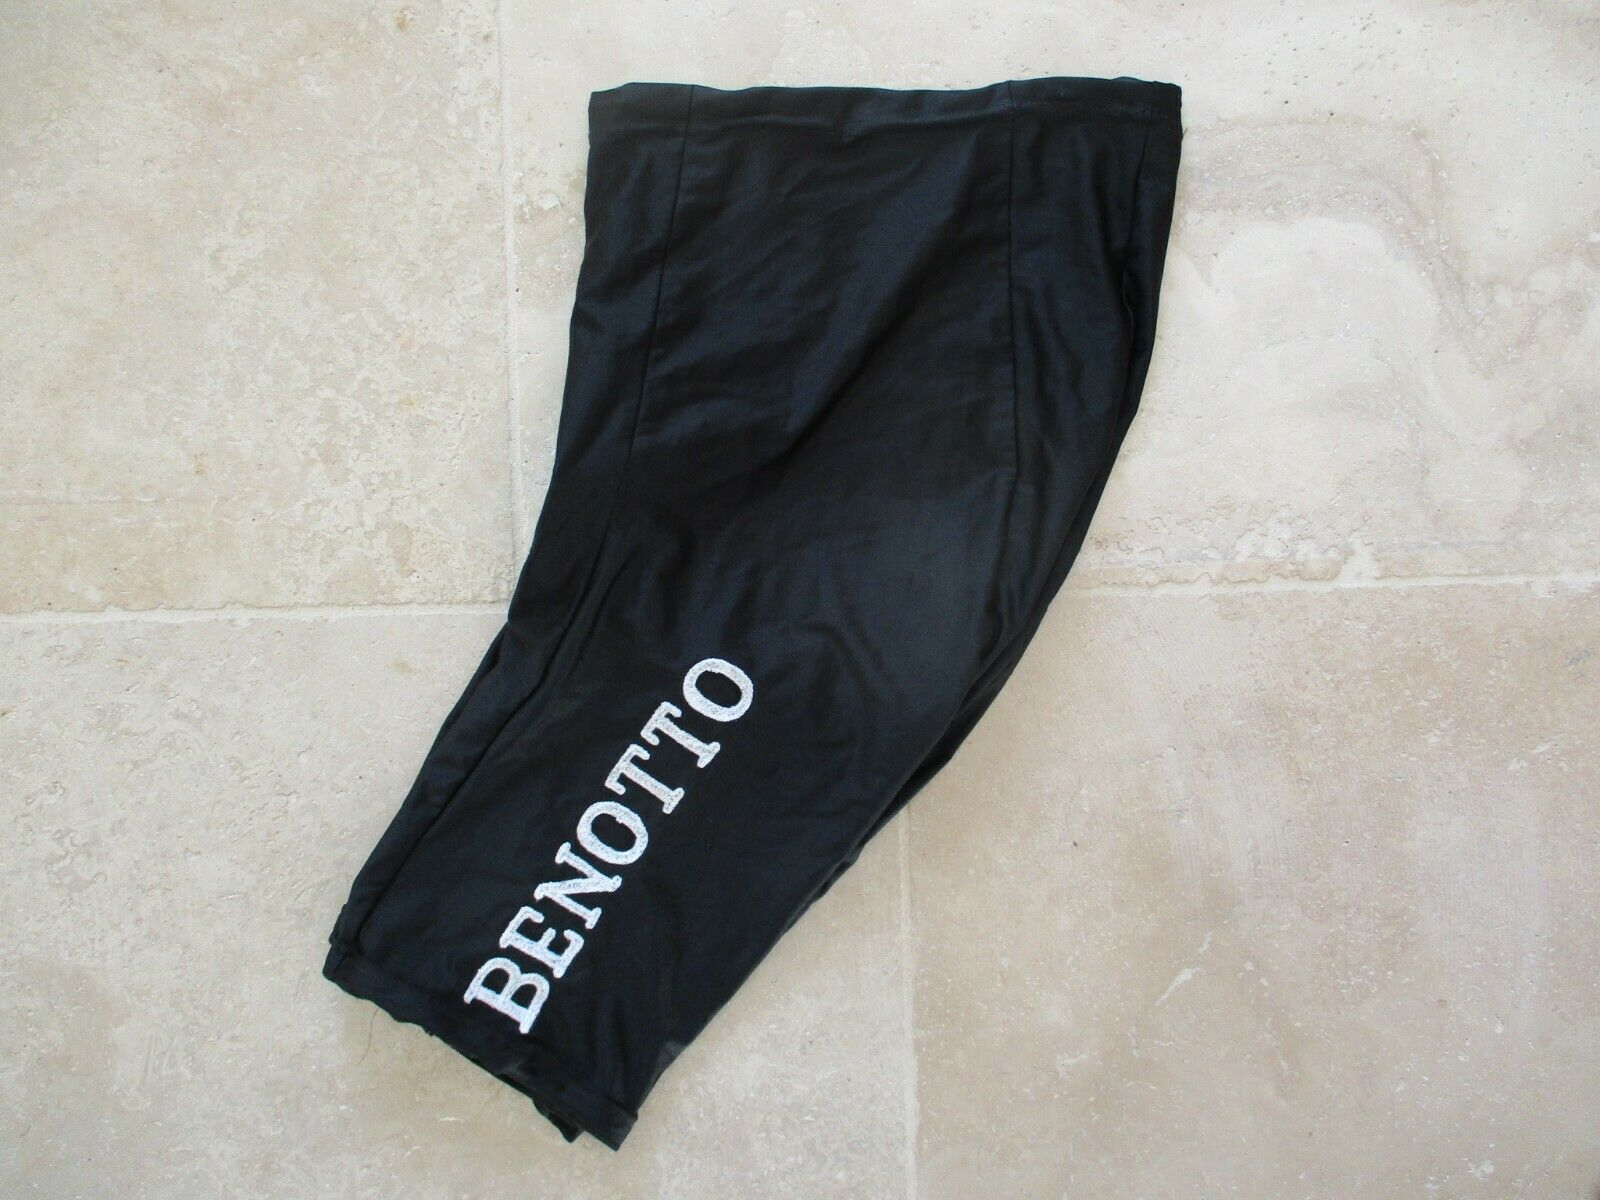 Cuissard cycliste SAMMONTANA BENOTTO 1981 vintage pantaloncini short ciclismo L